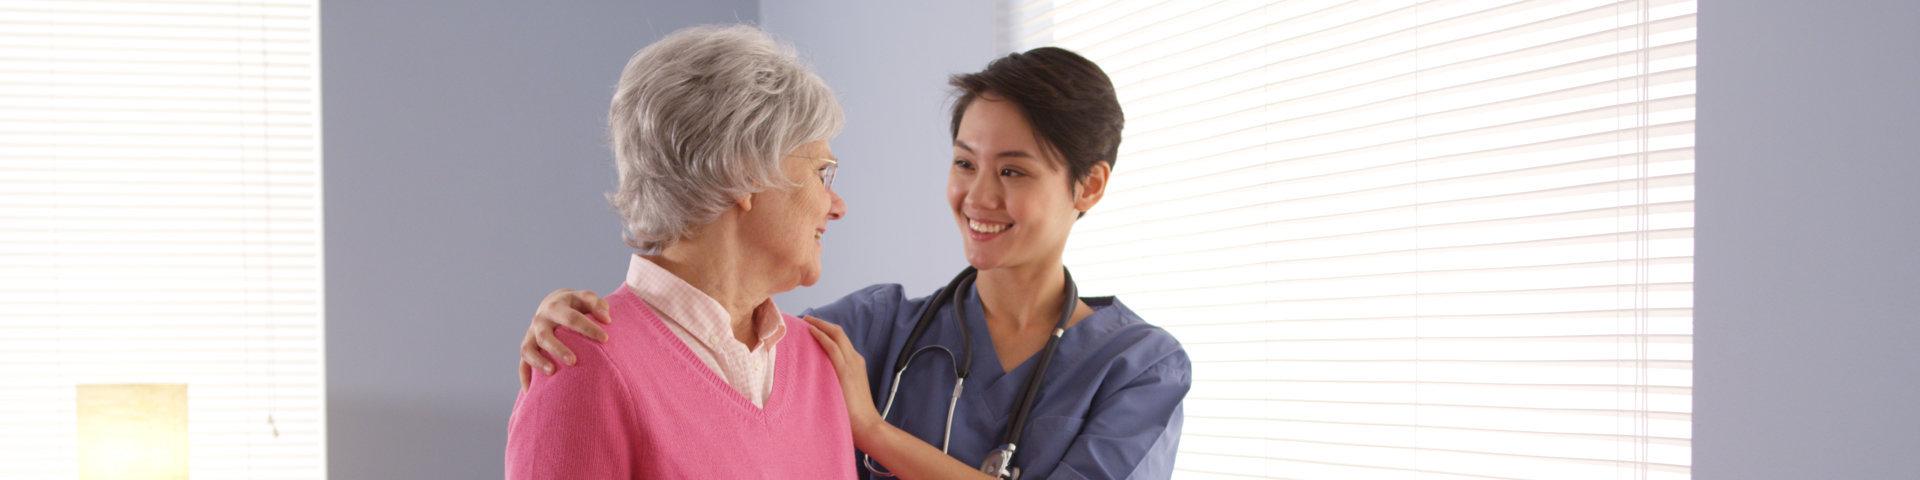 Nurse and elderly patient standing by window